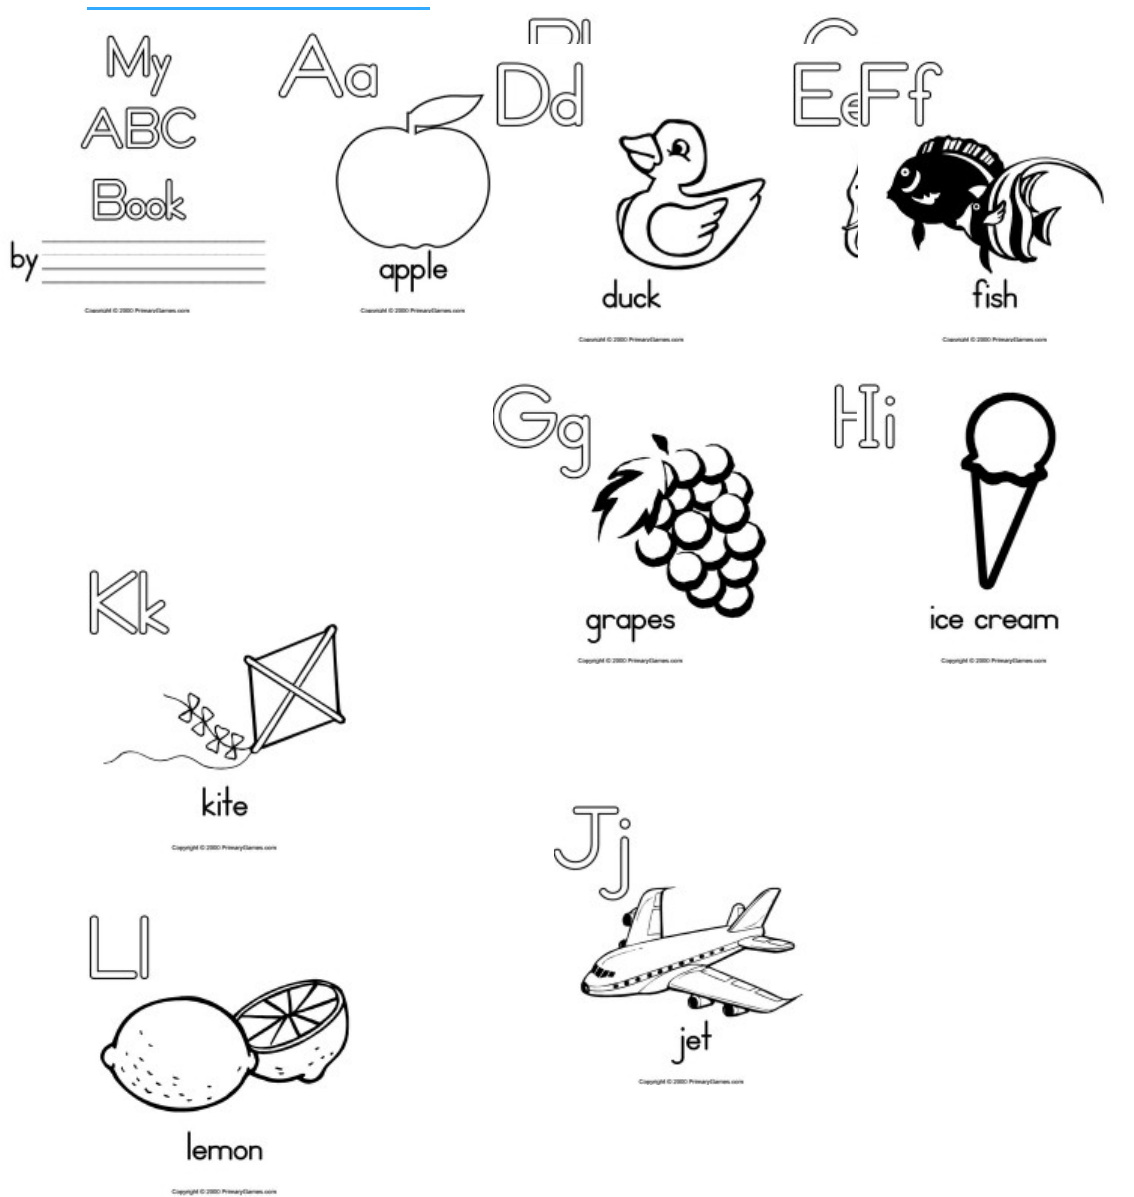 My ABC Book [DOCX Document]